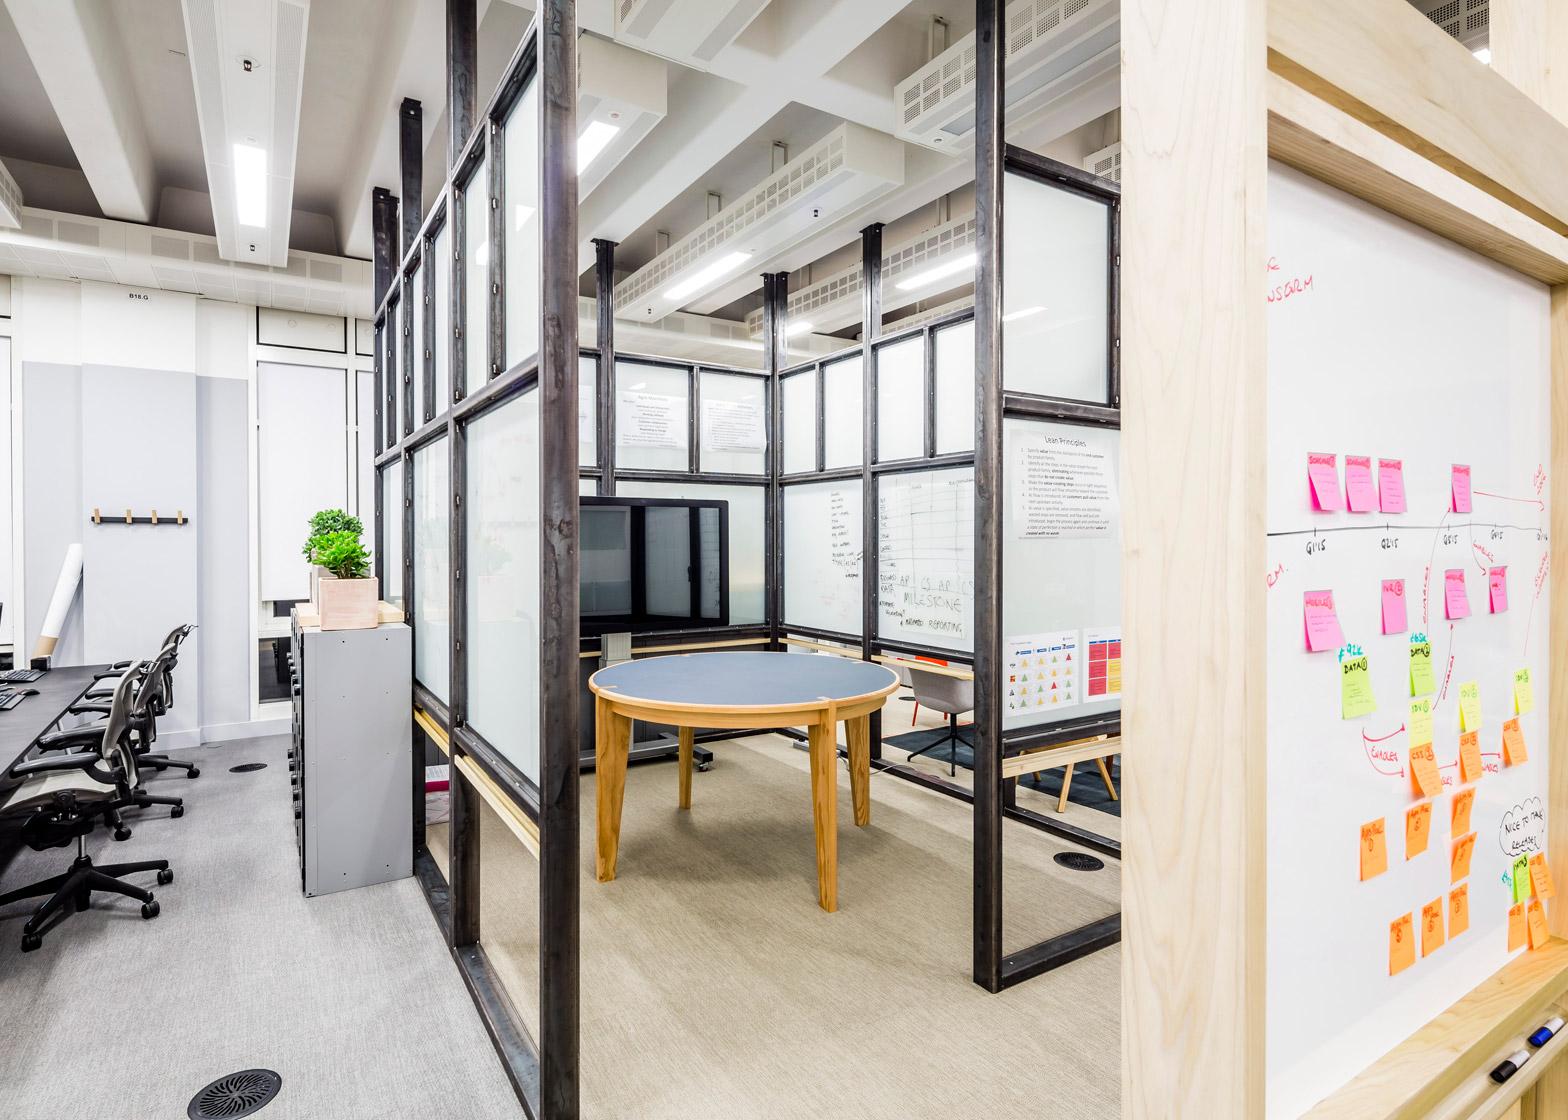 barclaycard-agile-workplace-APA-london-interior-design_dezeen_1568_9